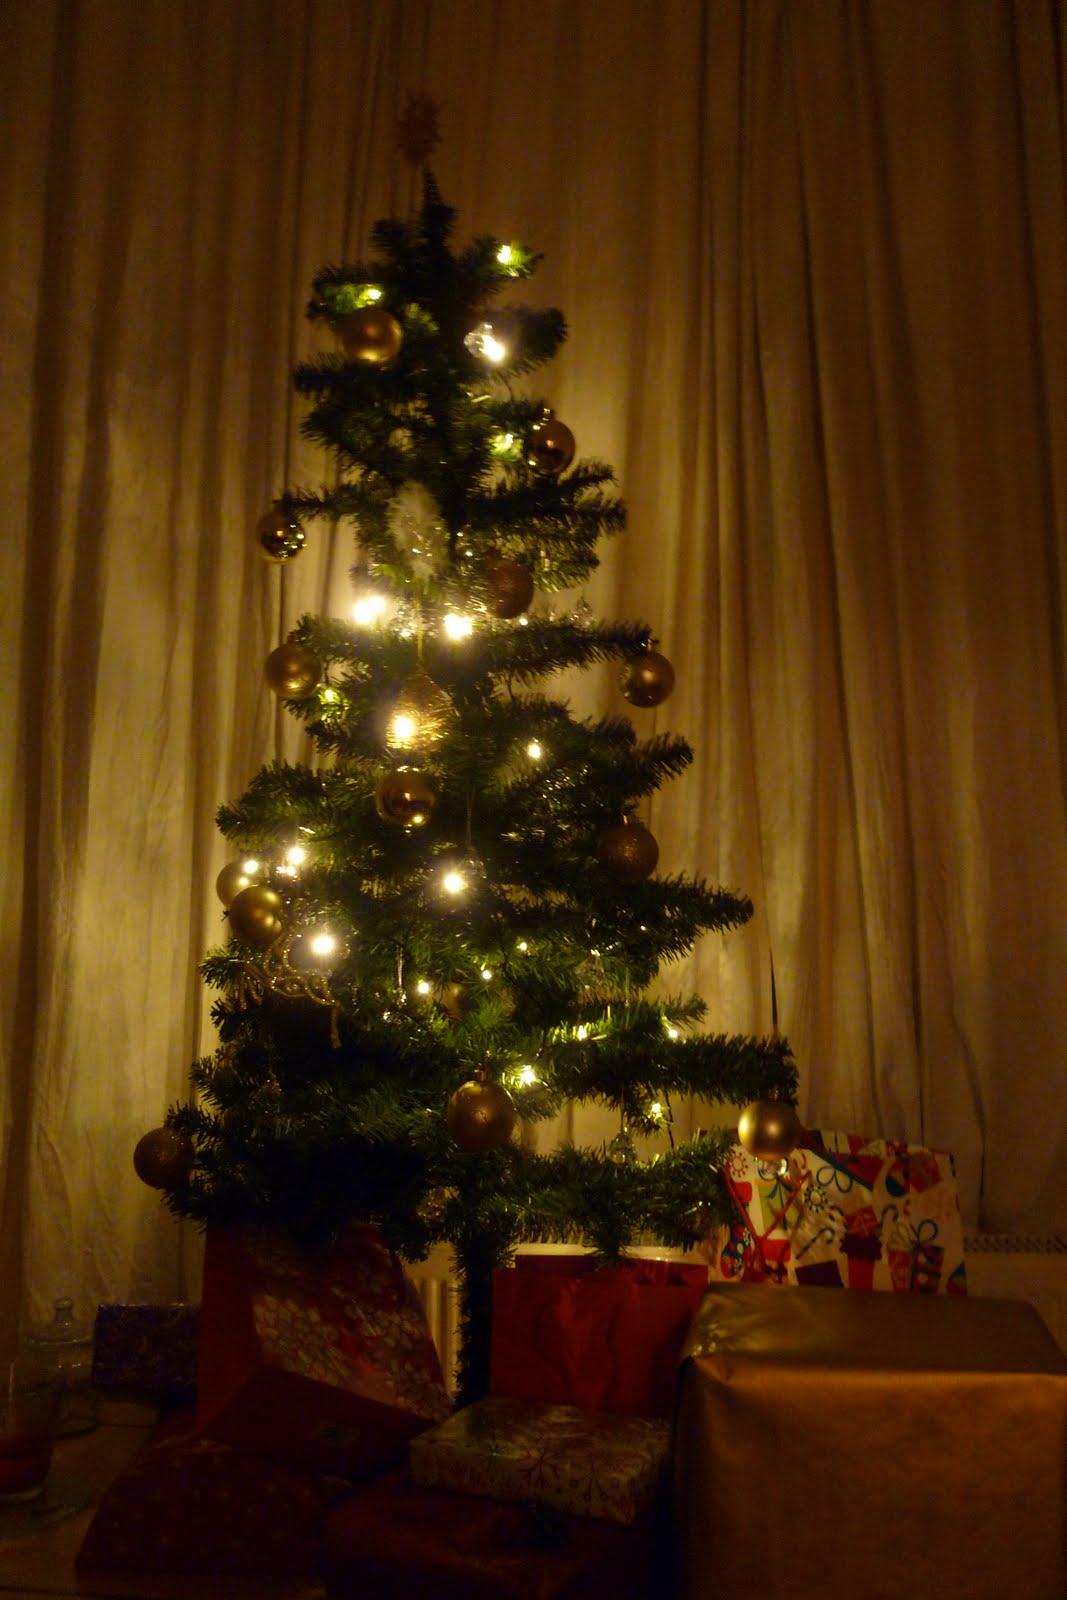 London calling: en svensk/irländsk/engelsk jul